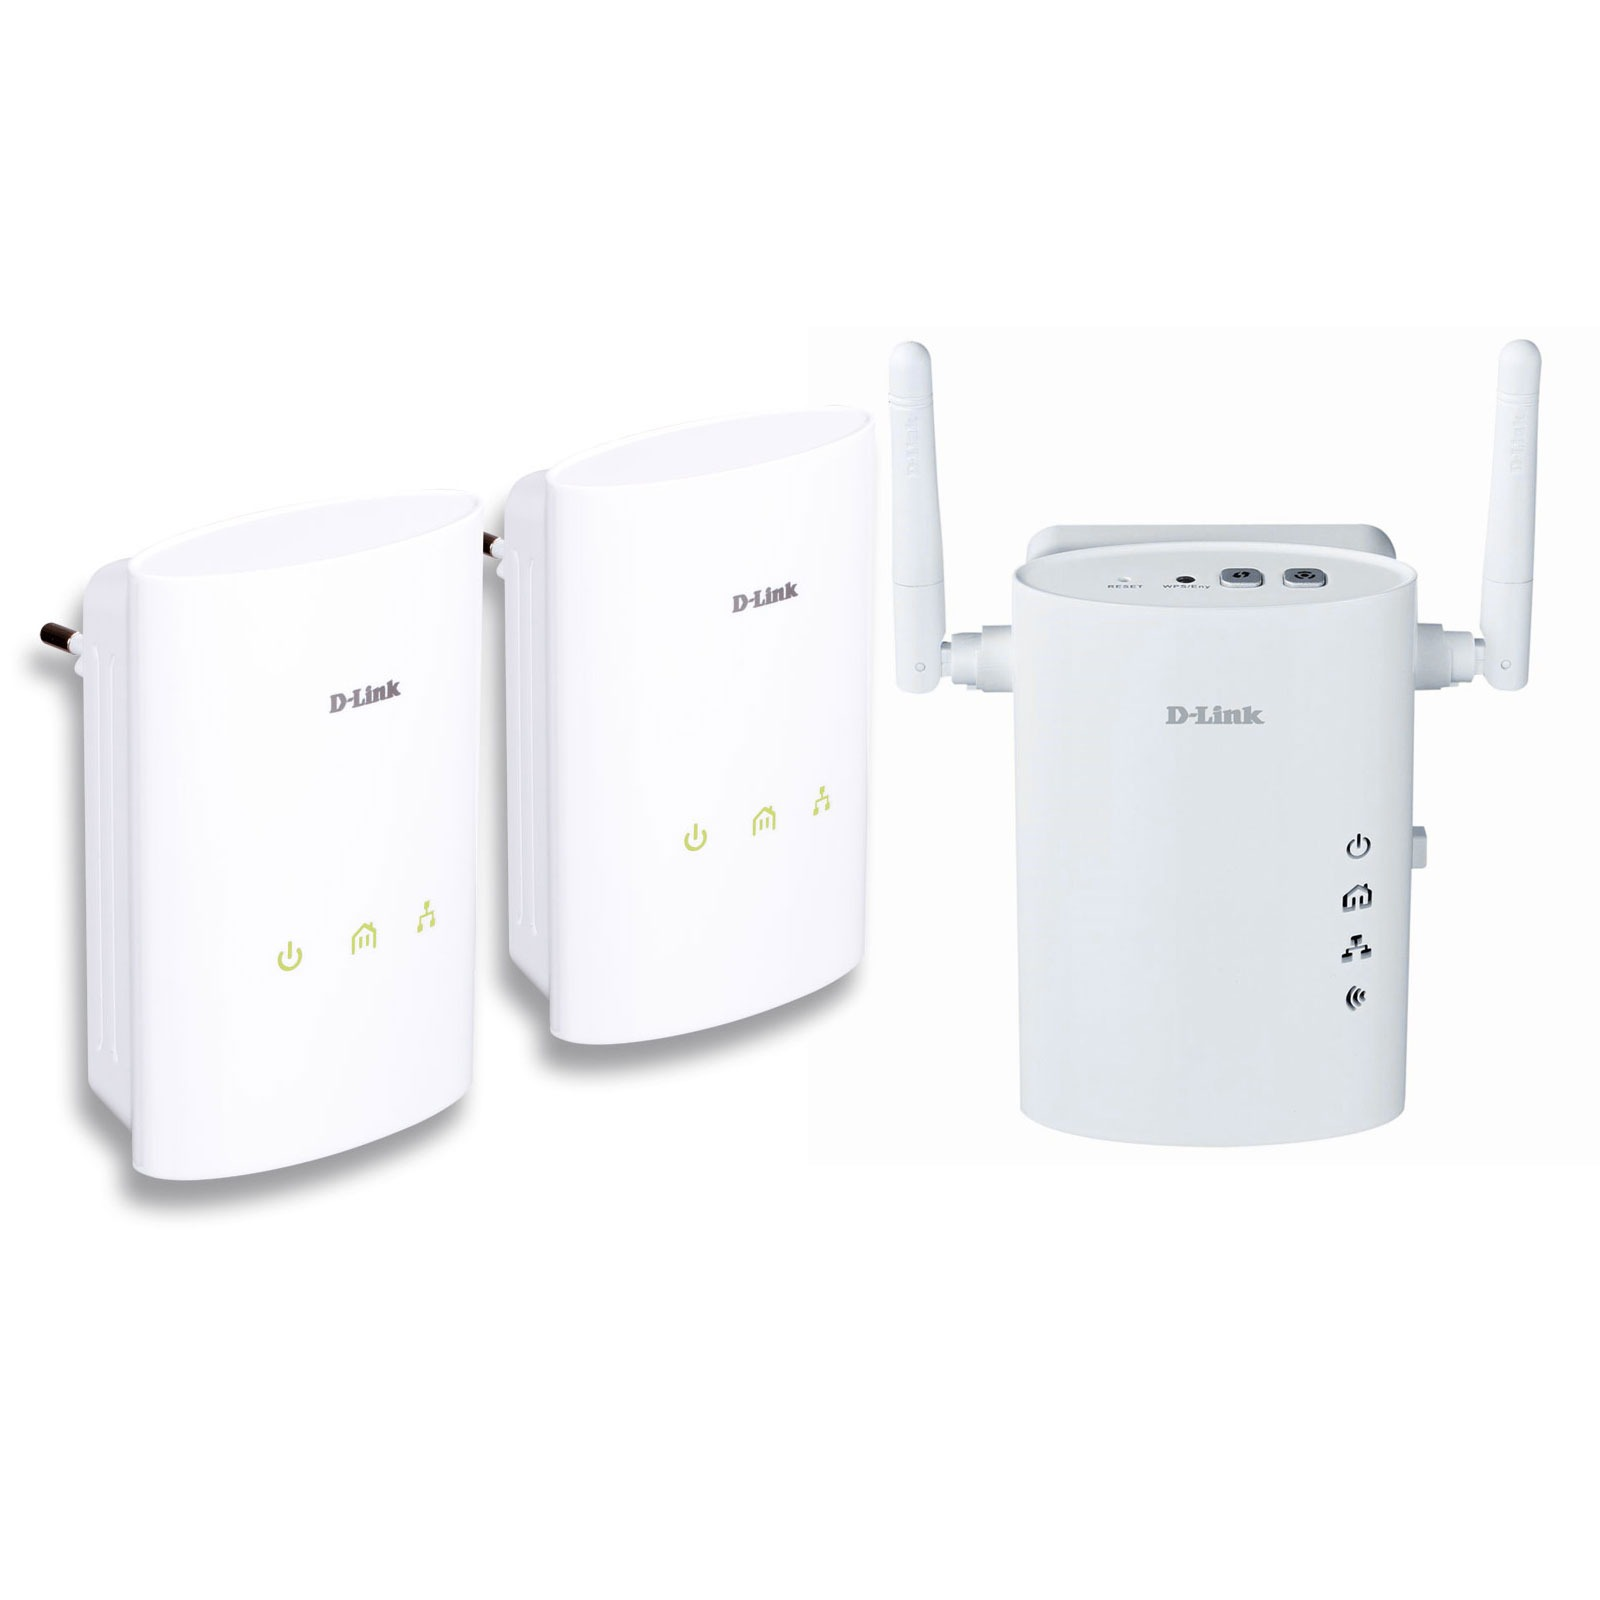 CPL D-Link DHP-307 + DHP-W306AV D-Link DHP-307 + DHP-W306AV - Pack de 2 adaptateurs CPL Homeplug AV 200Mbps + adaptateur CPL Wi-Fi